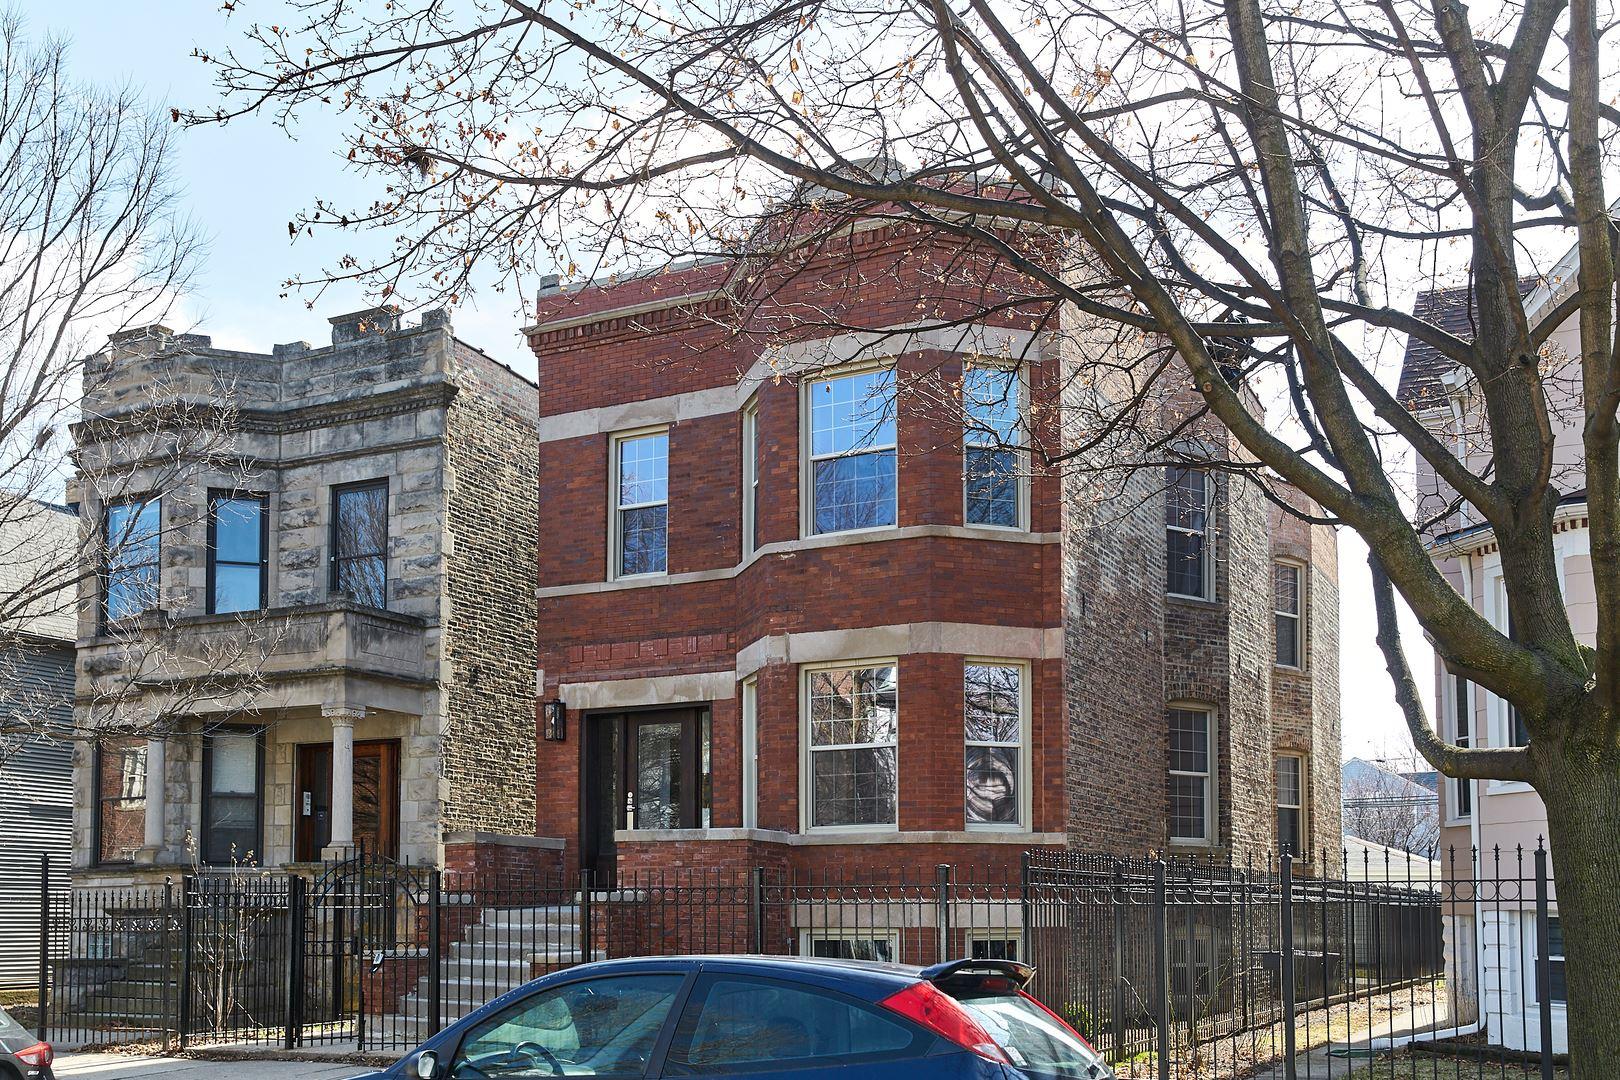 3421 W Belden Avenue, Chicago, IL 60647 - #: 10665232